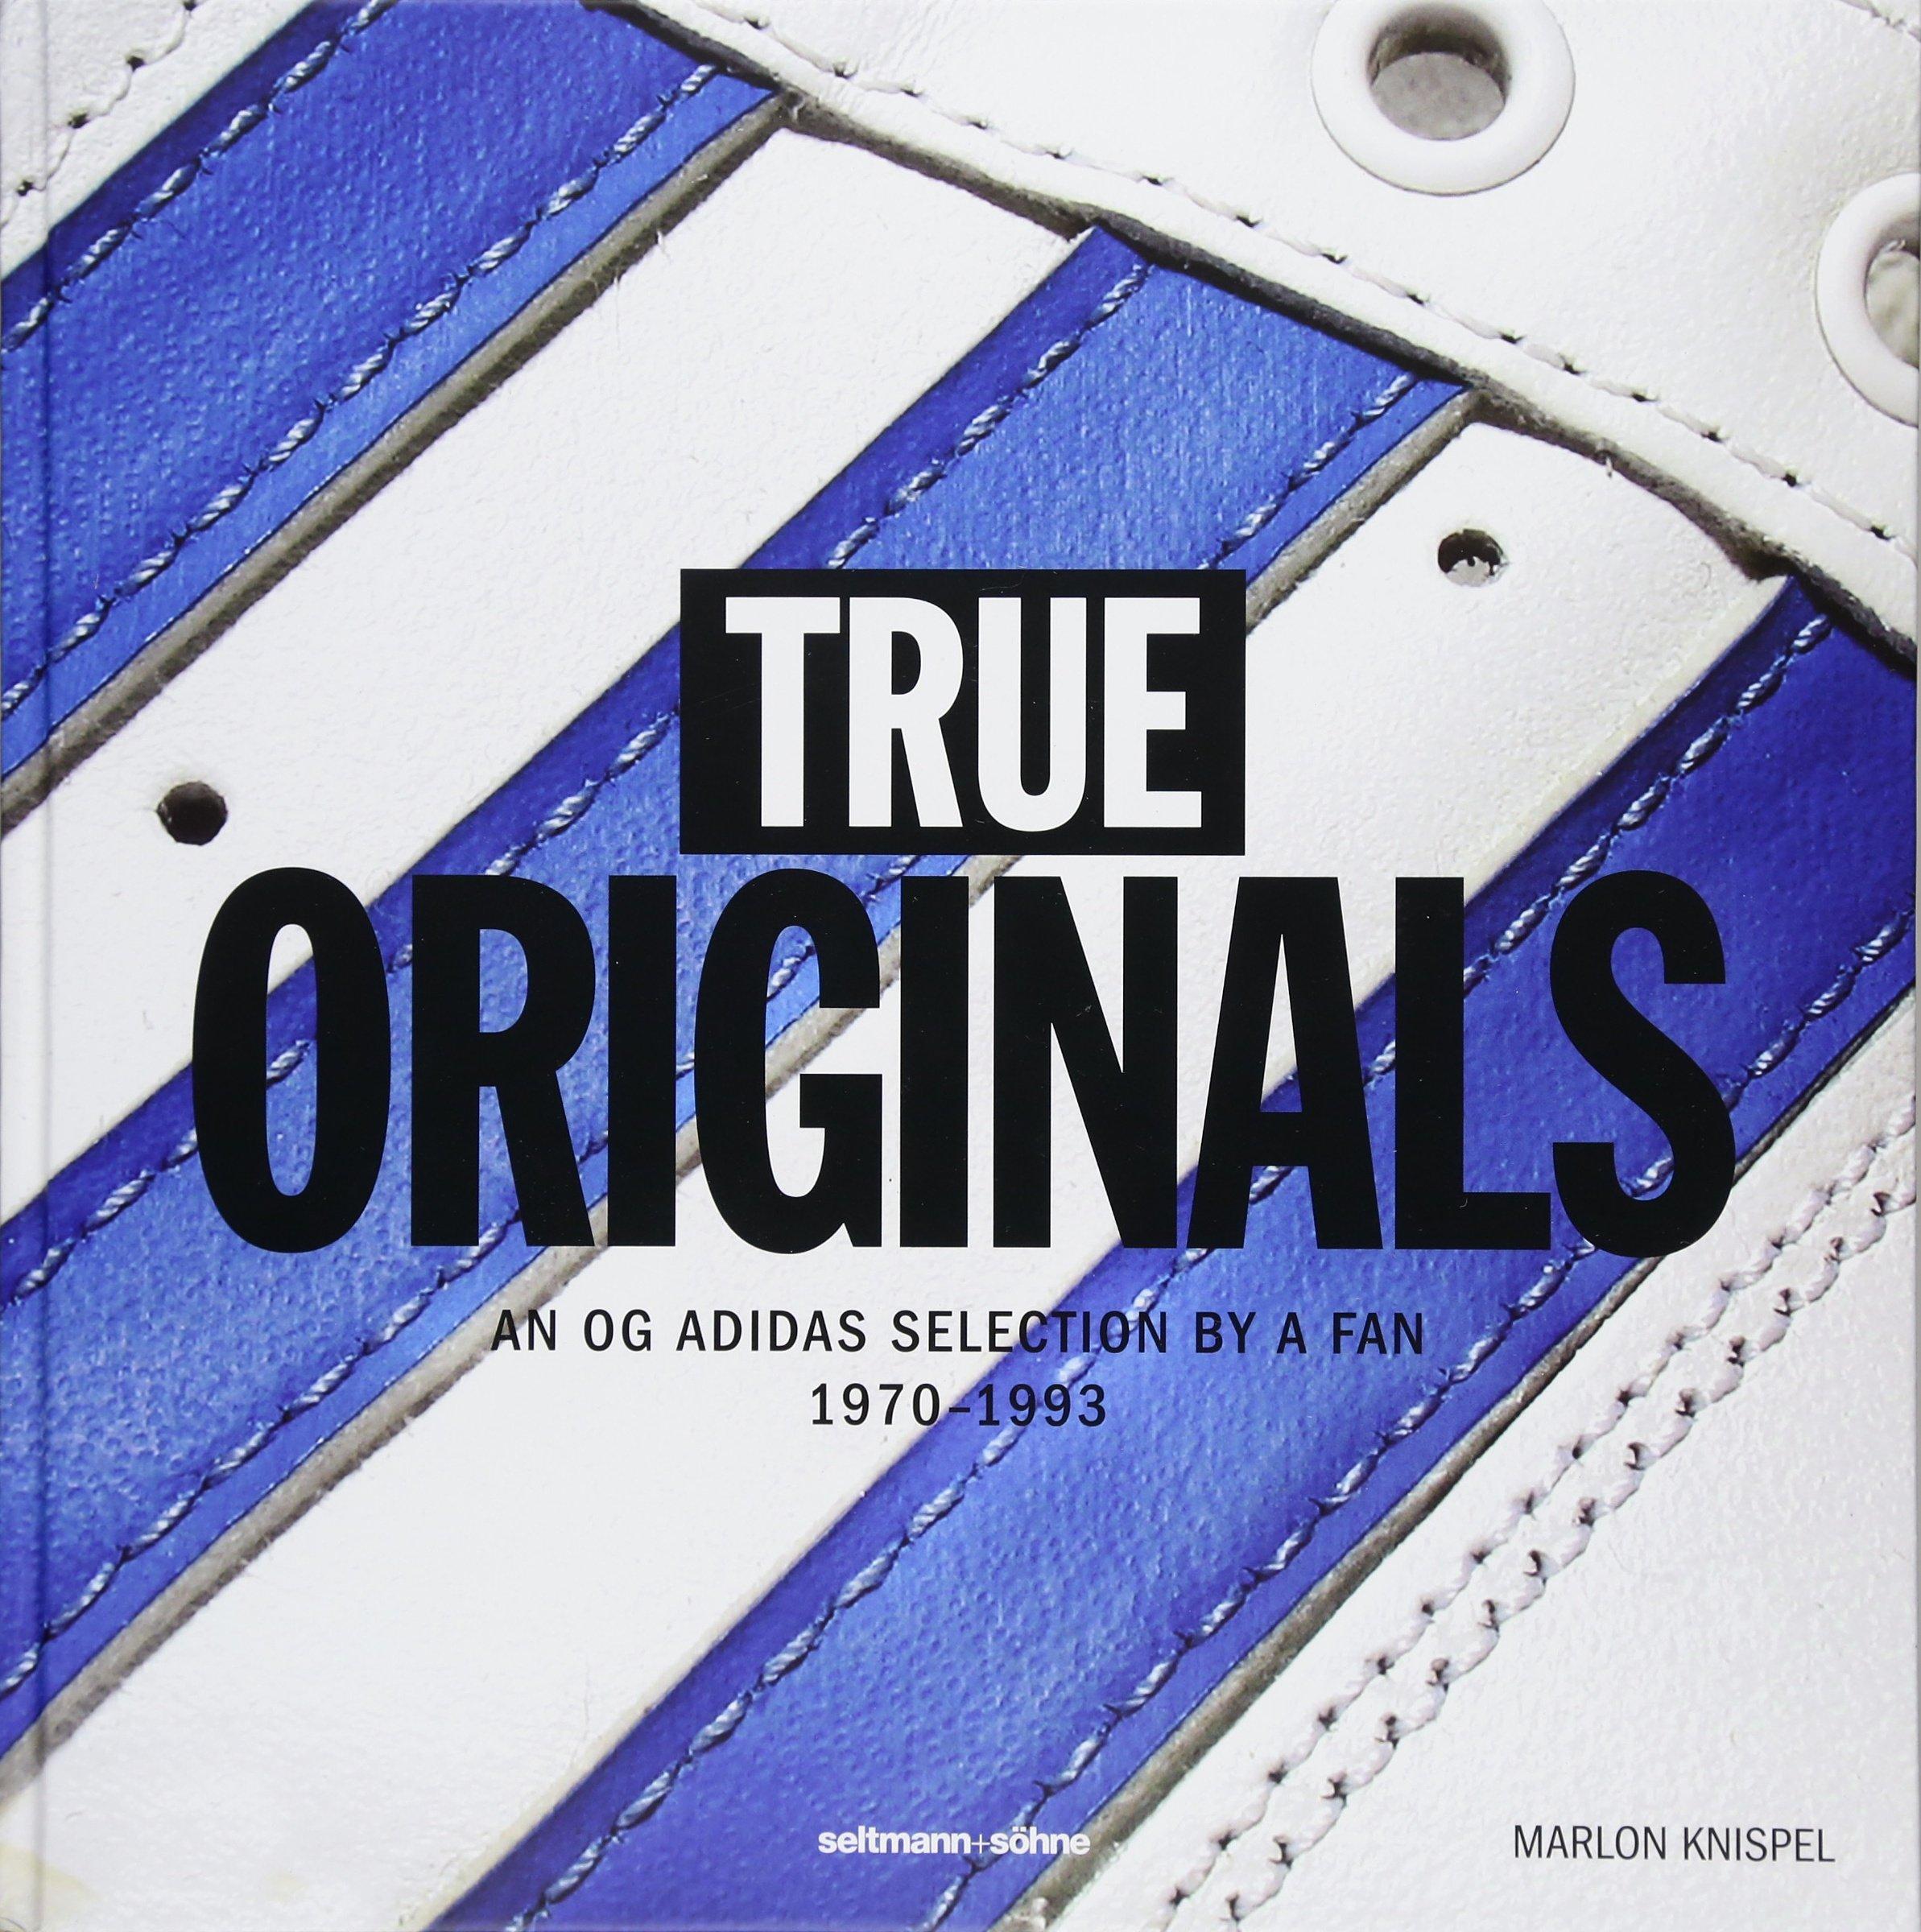 aaba832691e5a True Originals: An Og Adidas Selection by a Fan 1970-1993: Amazon.co ...